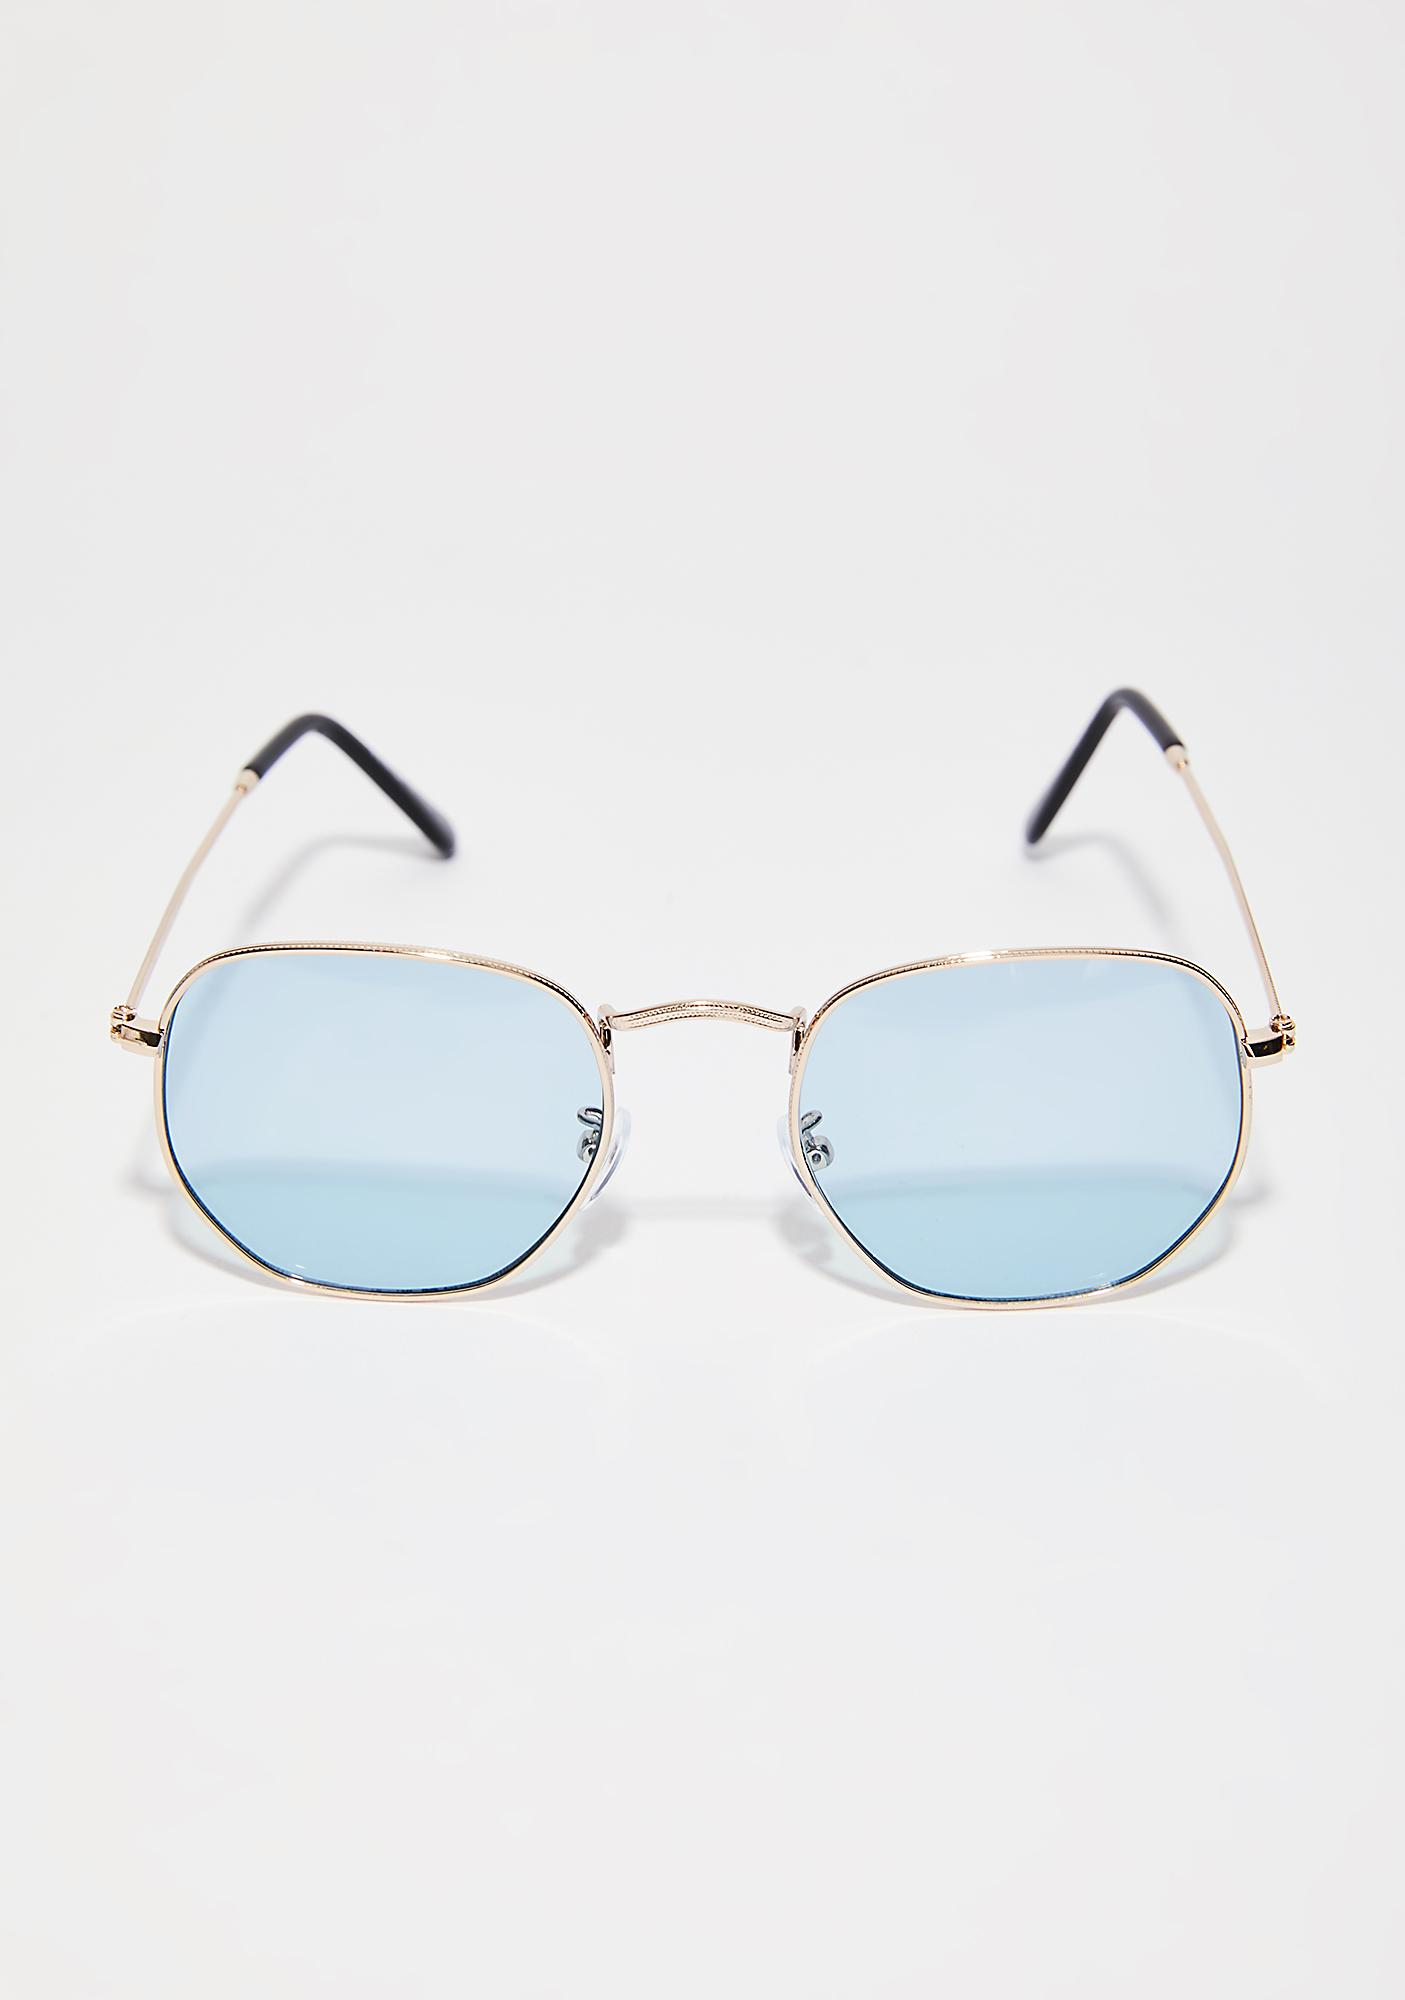 High Noon Sunglasses